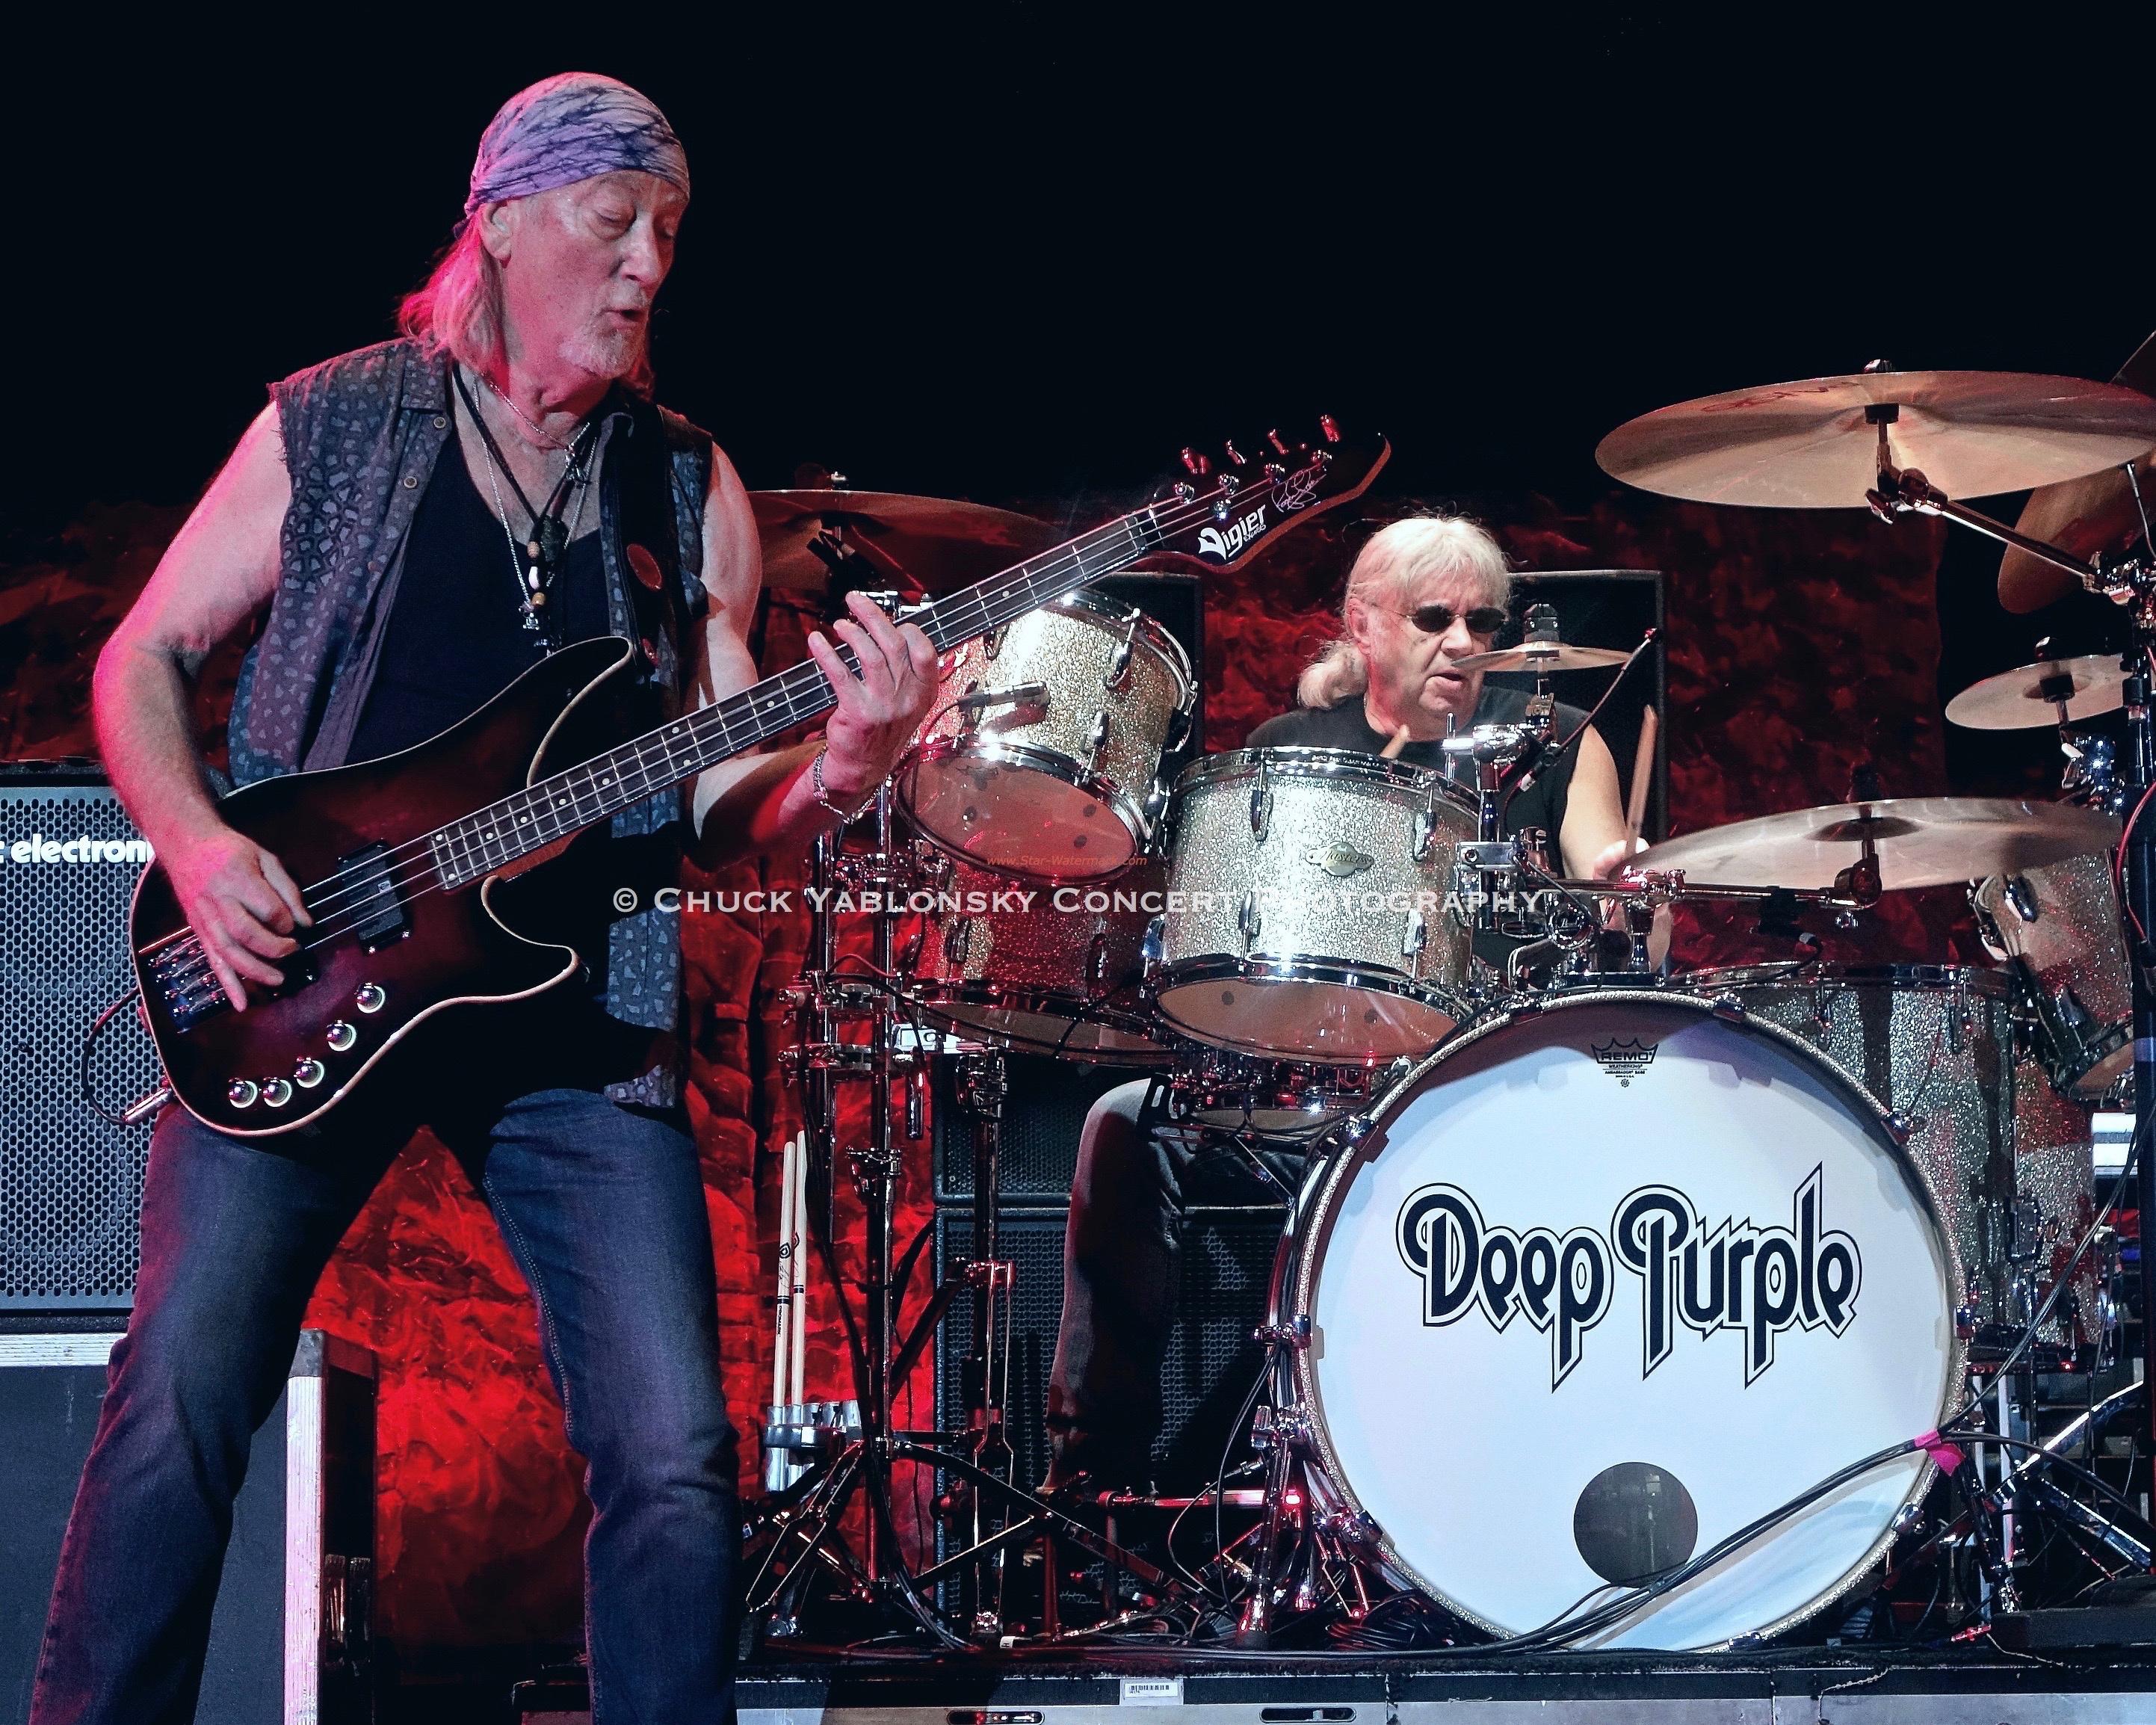 Roger Glover & Ian Paice - Deep Purple